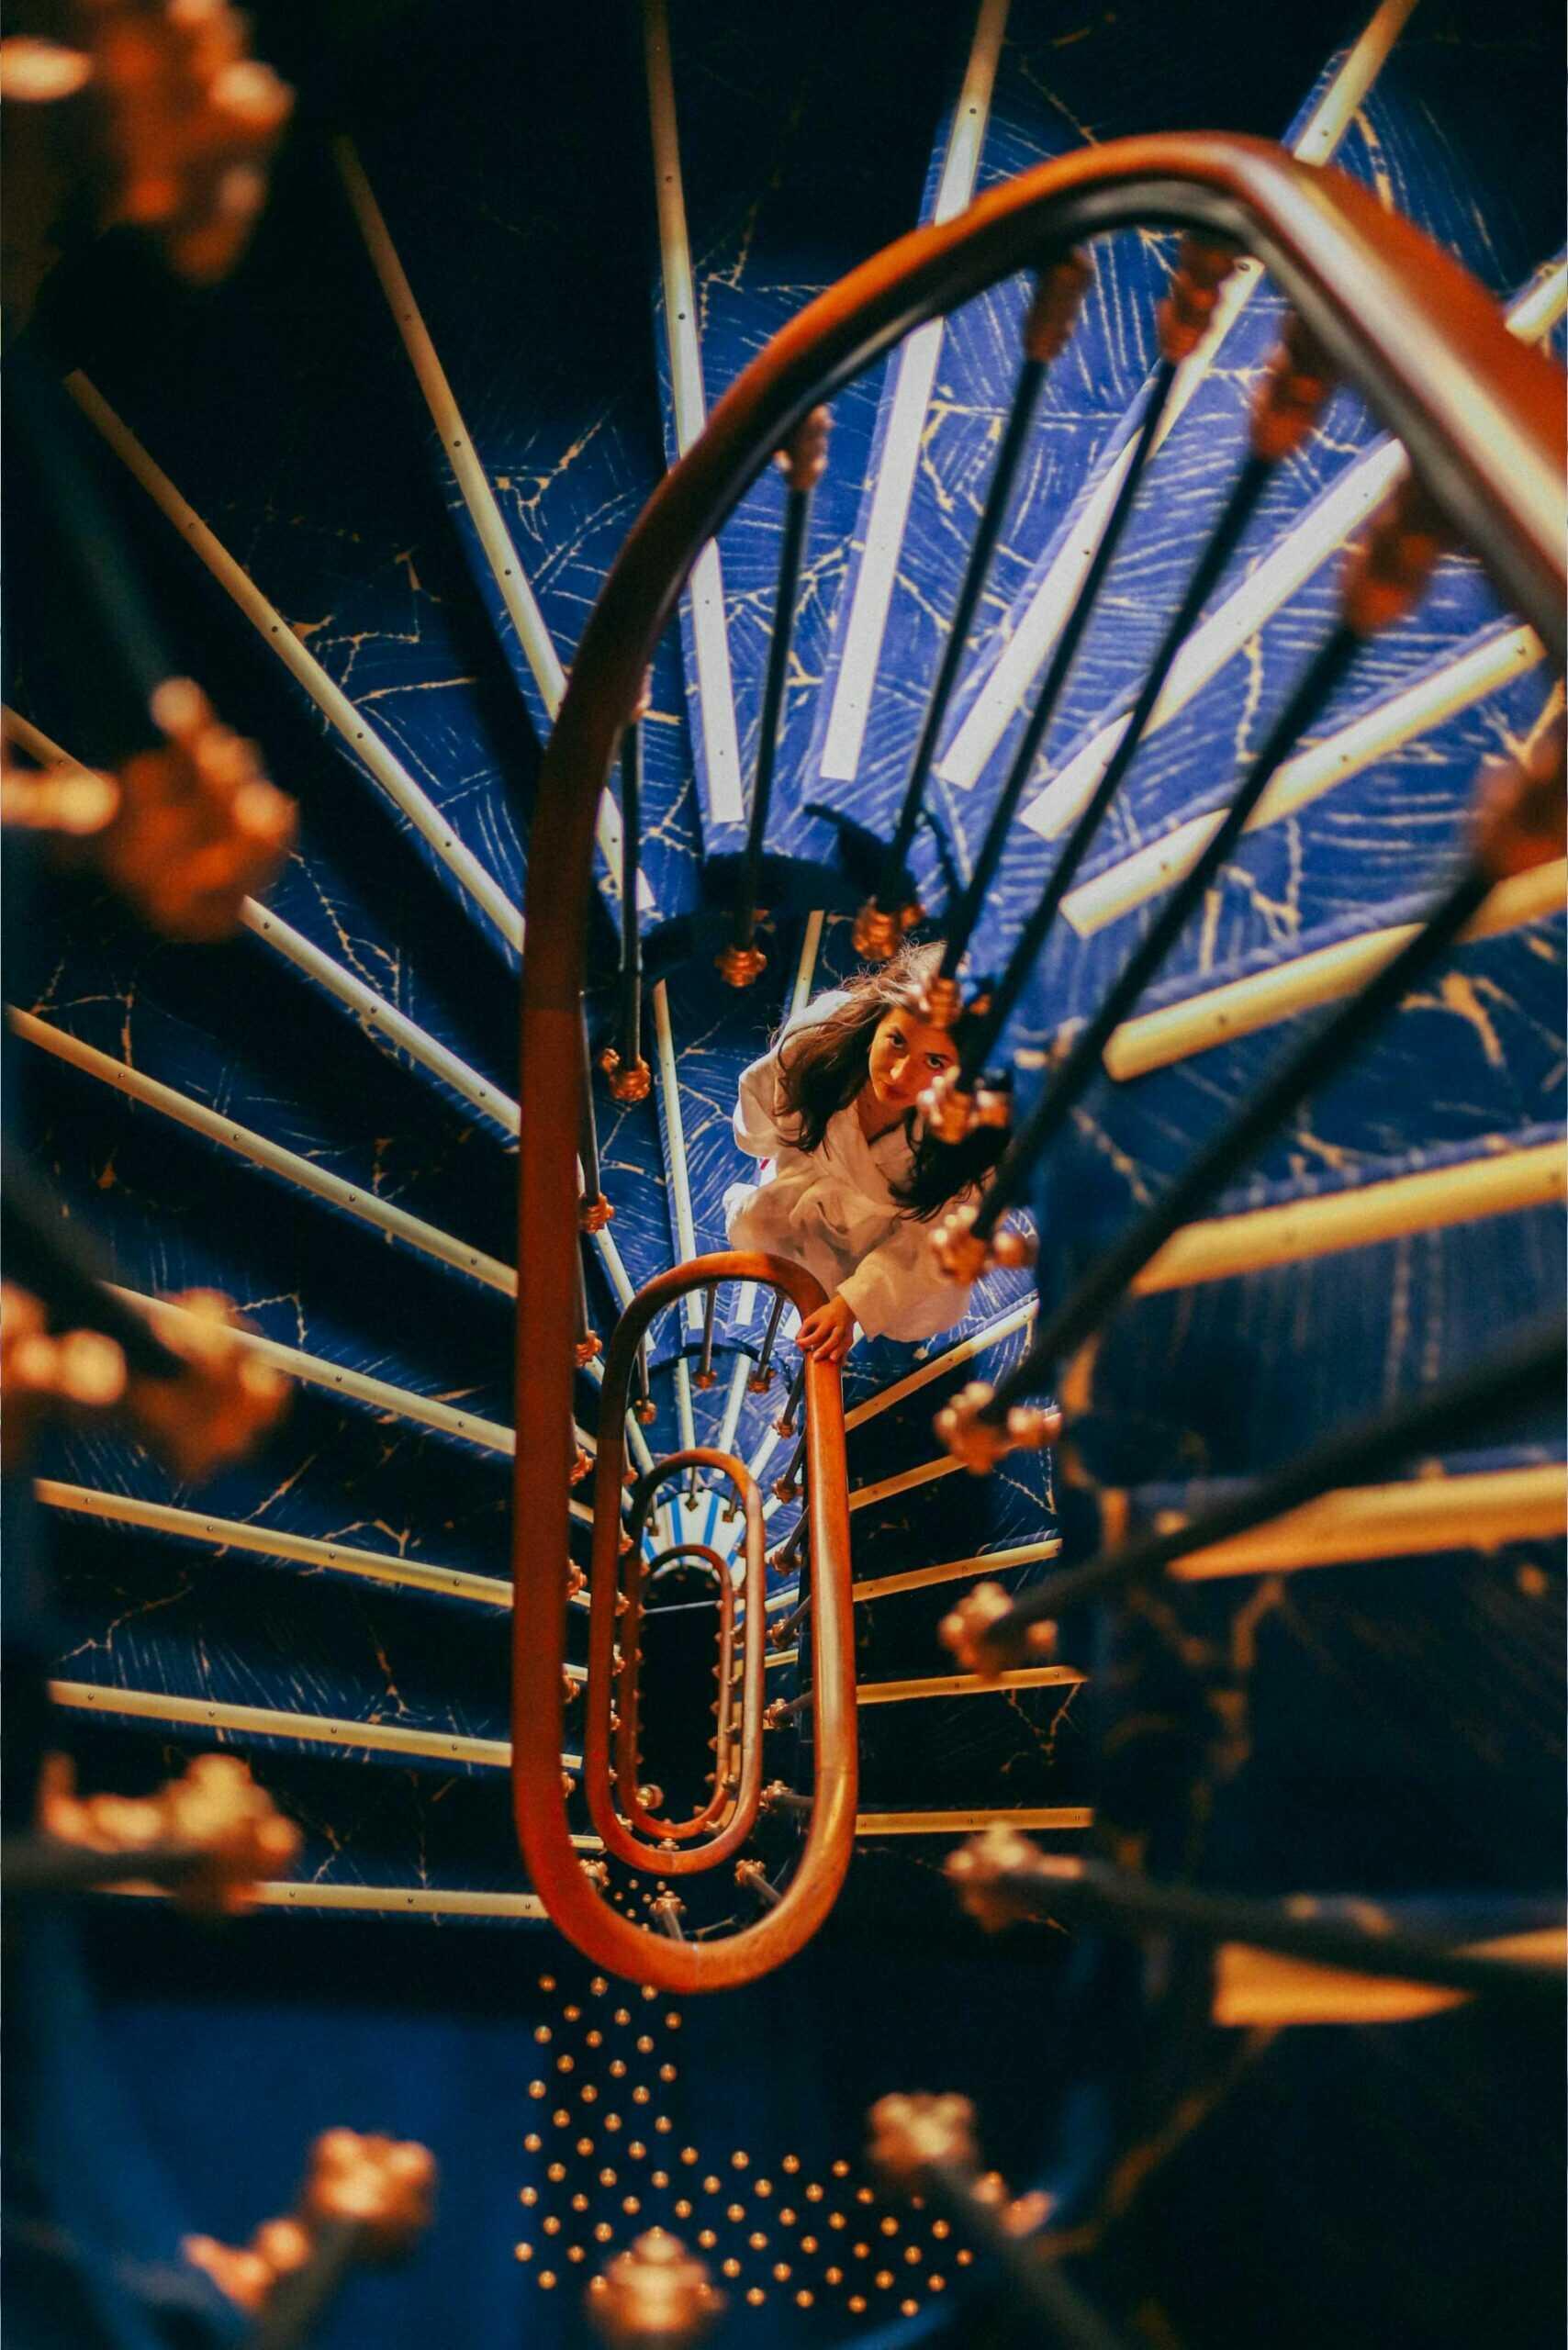 maison_nabis_by_happyculture_paris_escalier-scaled.jpg